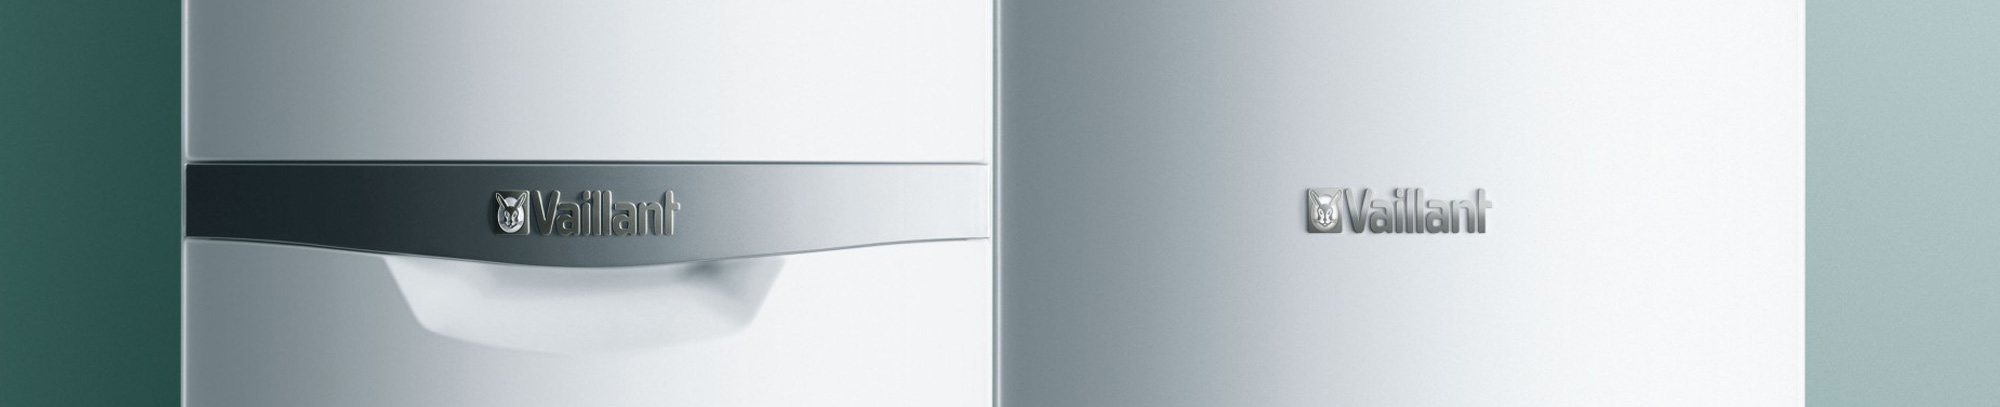 installation de votre chaudi re gaz condensation par vigo. Black Bedroom Furniture Sets. Home Design Ideas